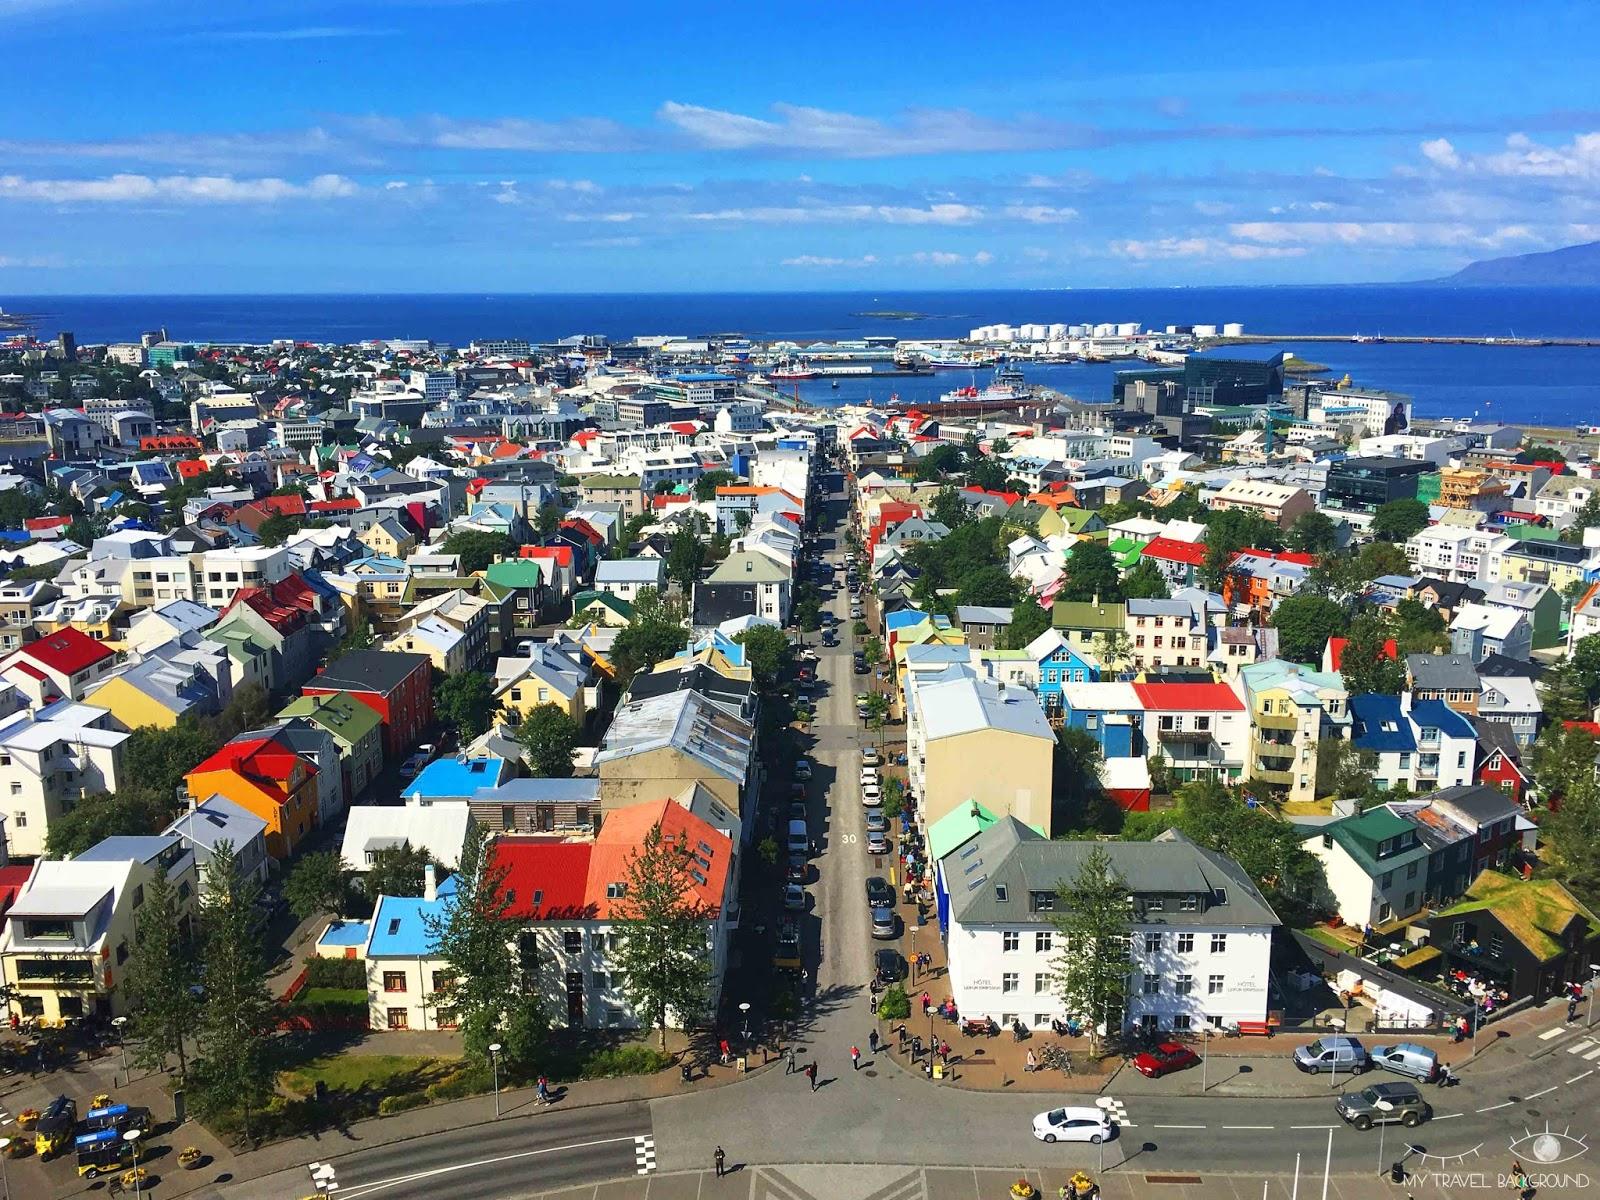 My Travel Background : 18 lieux à découvrir absolument en Islande, visiter la capitale Reykjavik